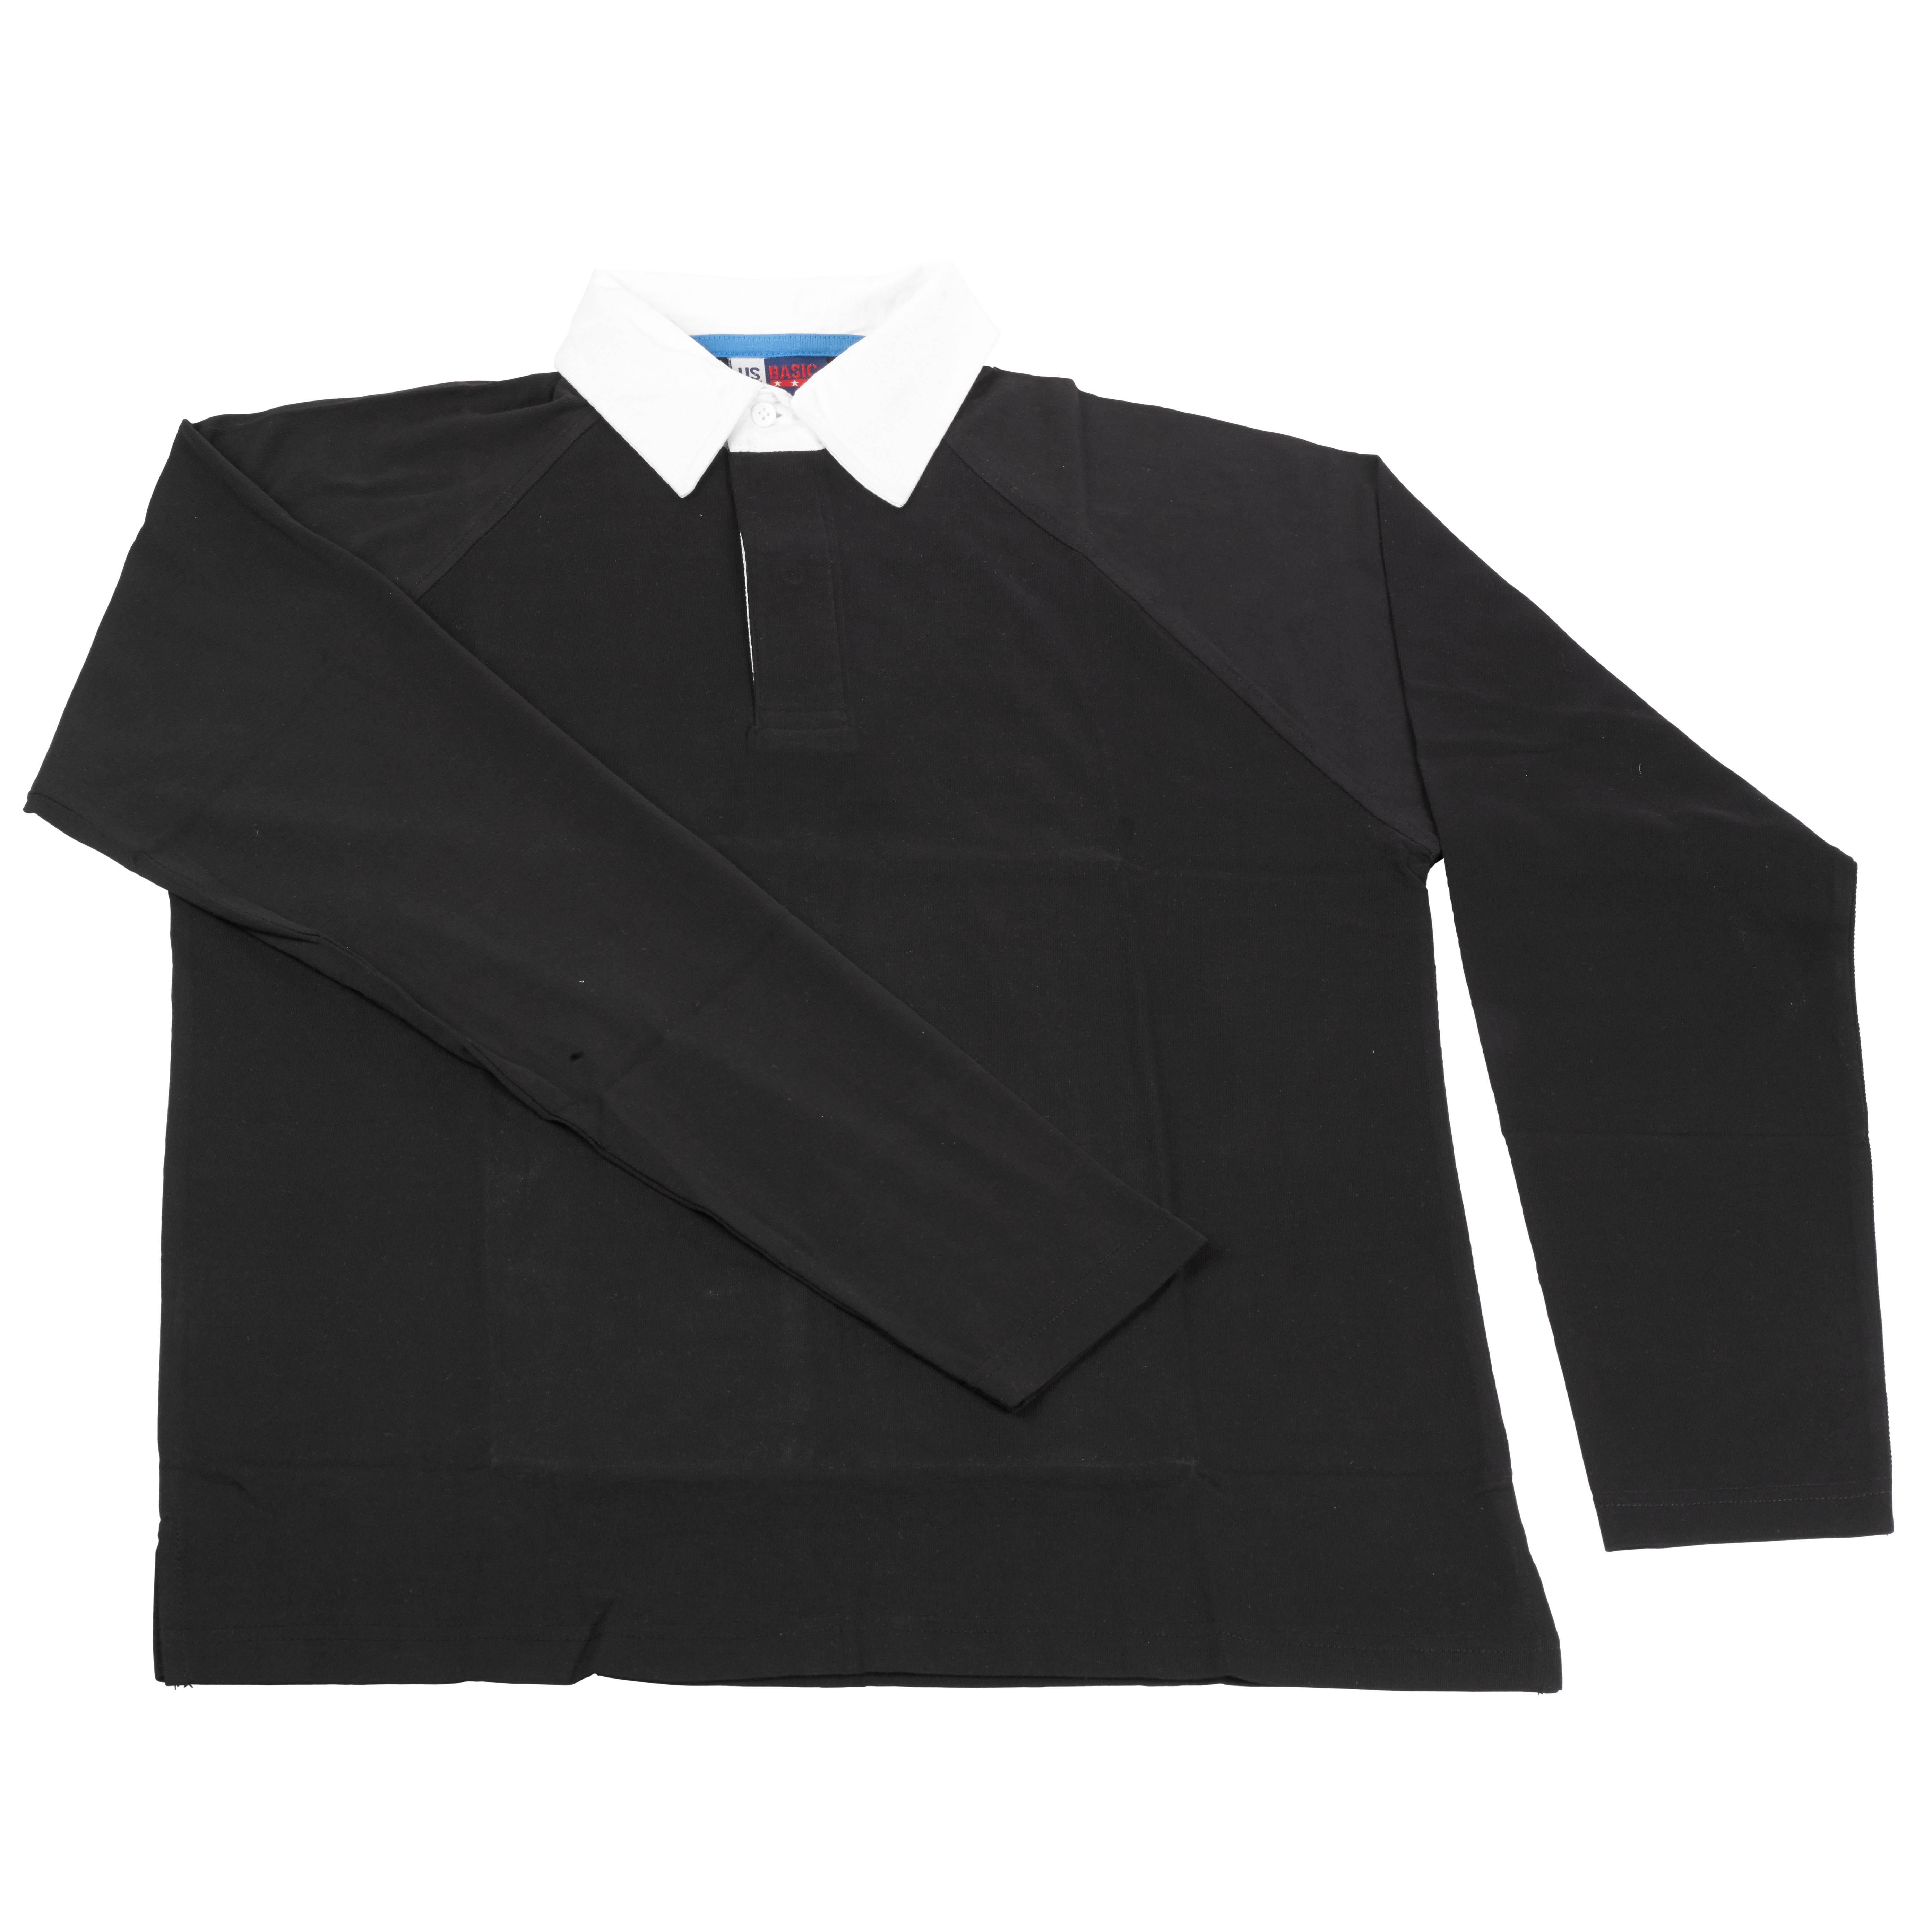 Black t shirt white collar -  9 99